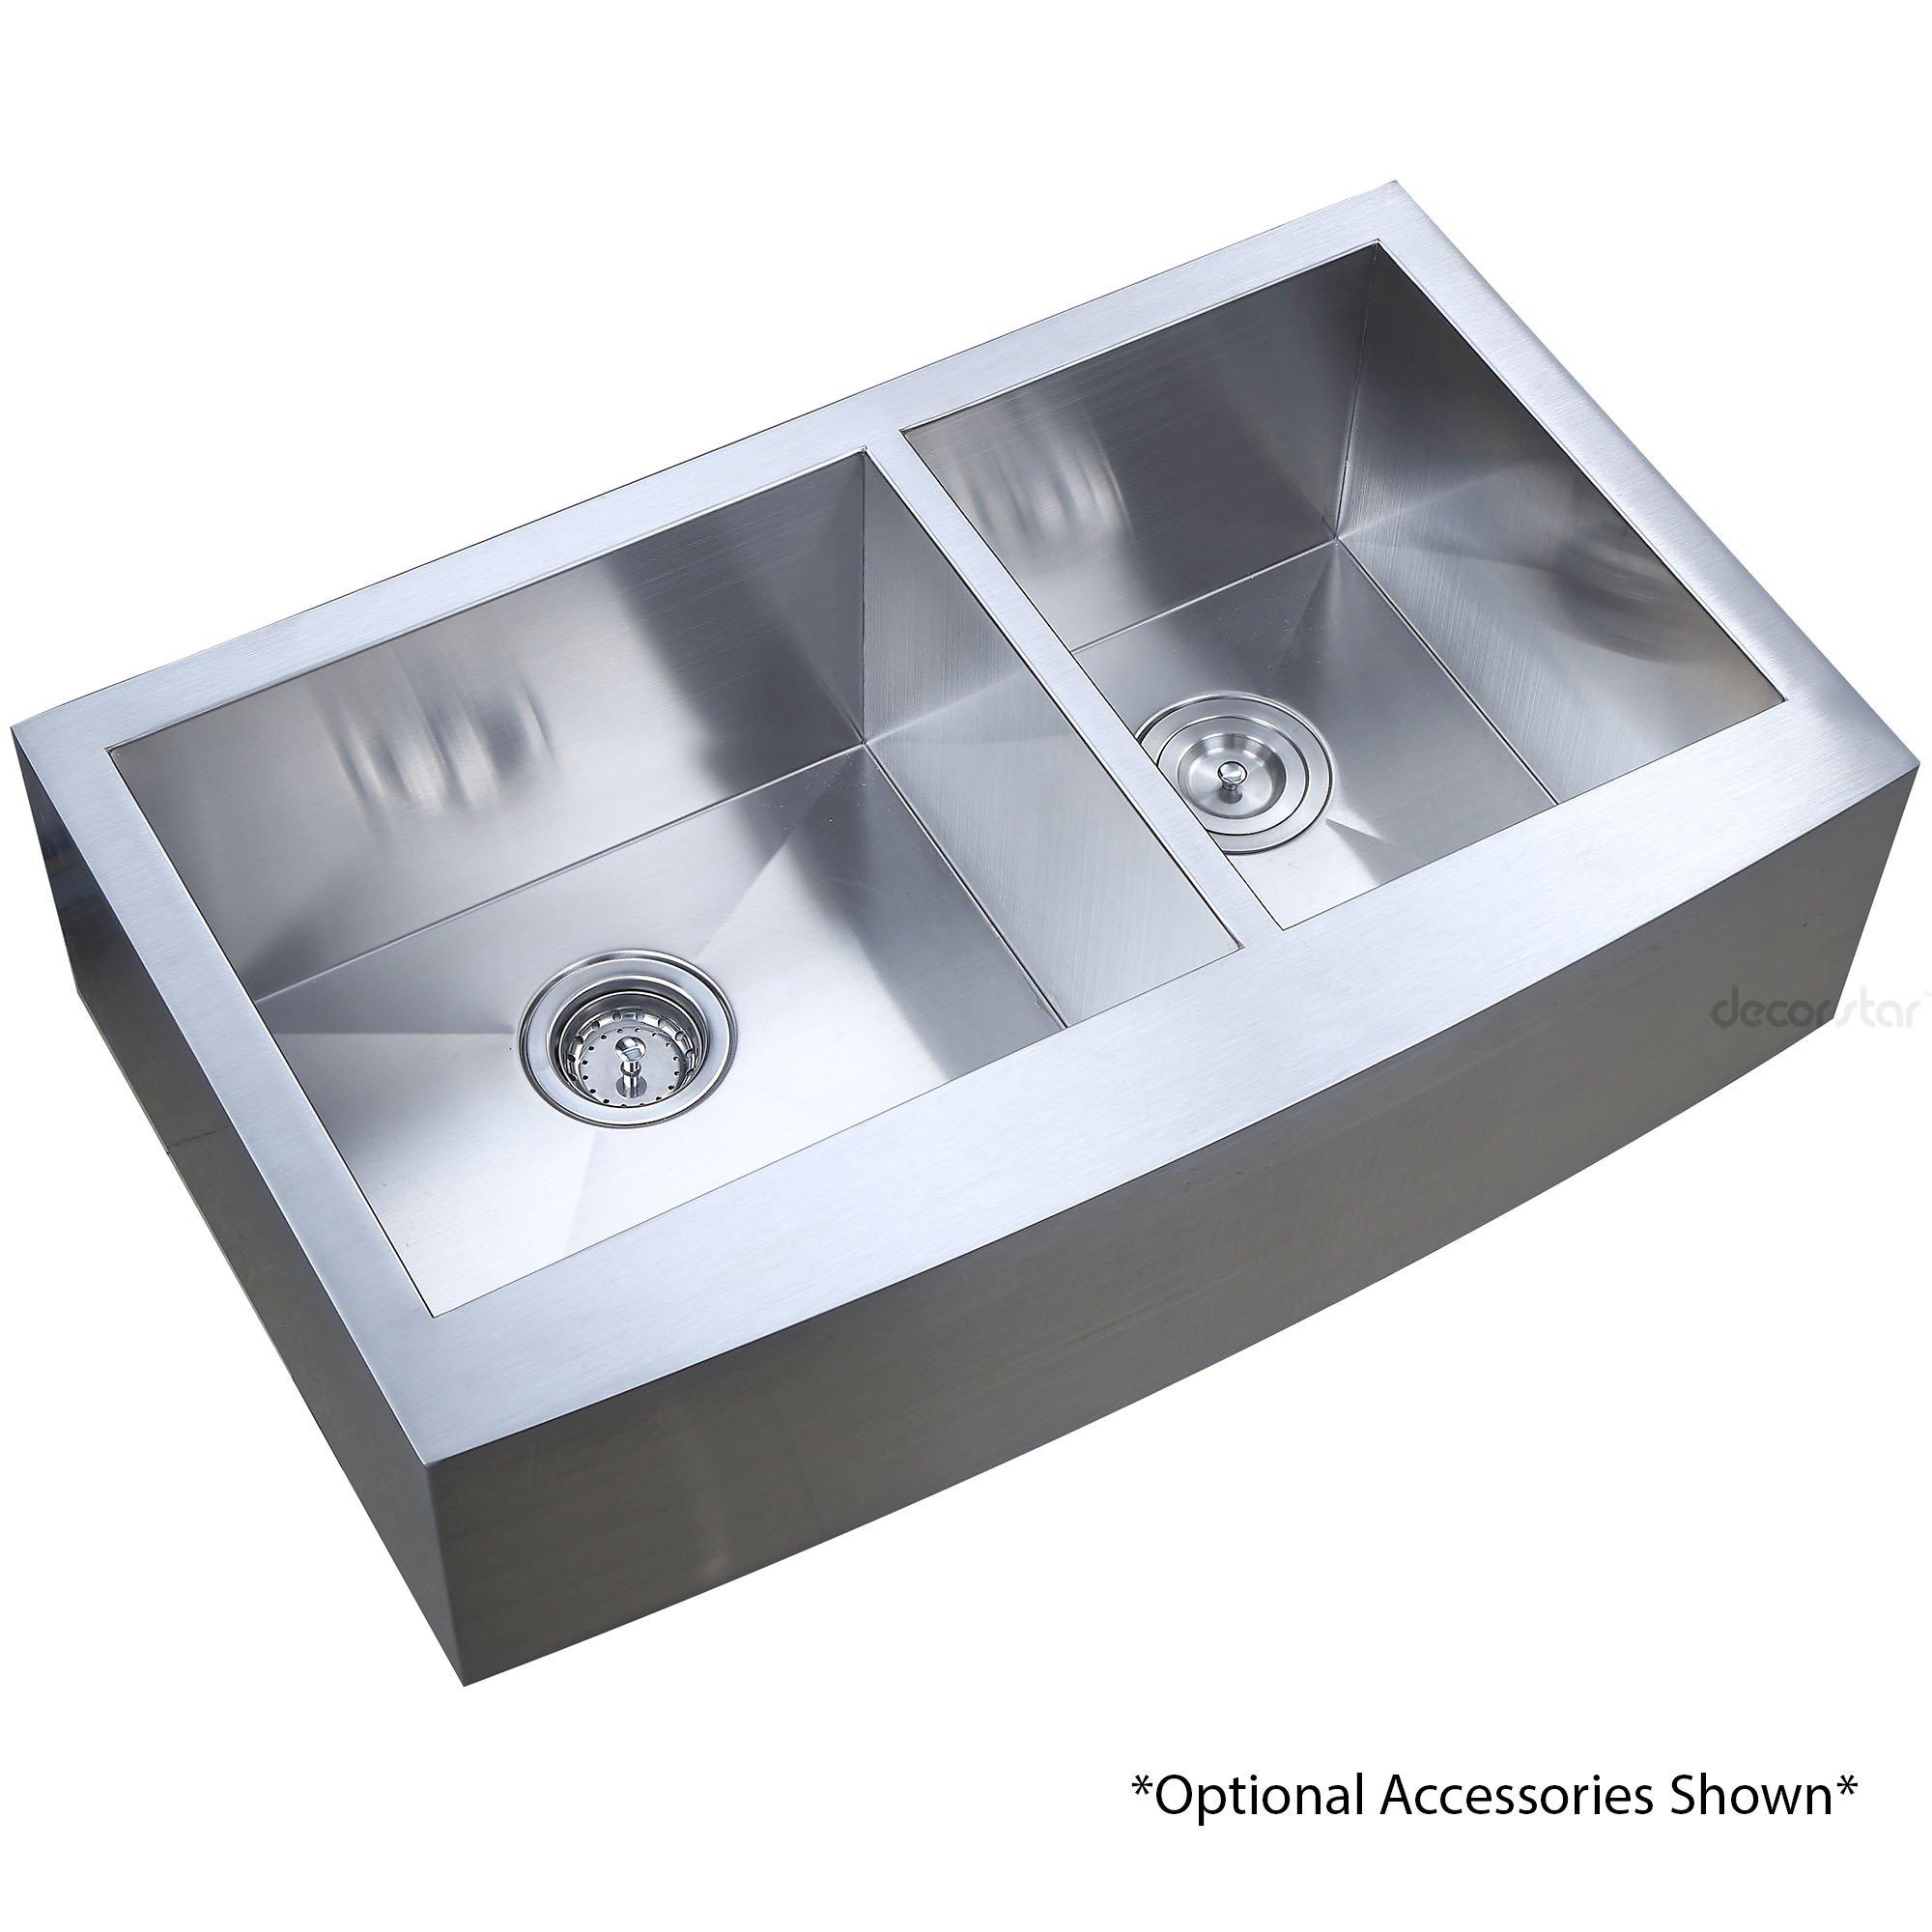 Decor Star F-002-Z 33 Inch x 20 Inch Farmhouse Apron 60/40 Offset Double Bowl 16 Gauge Stainless Steel Luxury Handmade Kitchen Sink cUPC Zero Radius by Décor Star (Image #7)